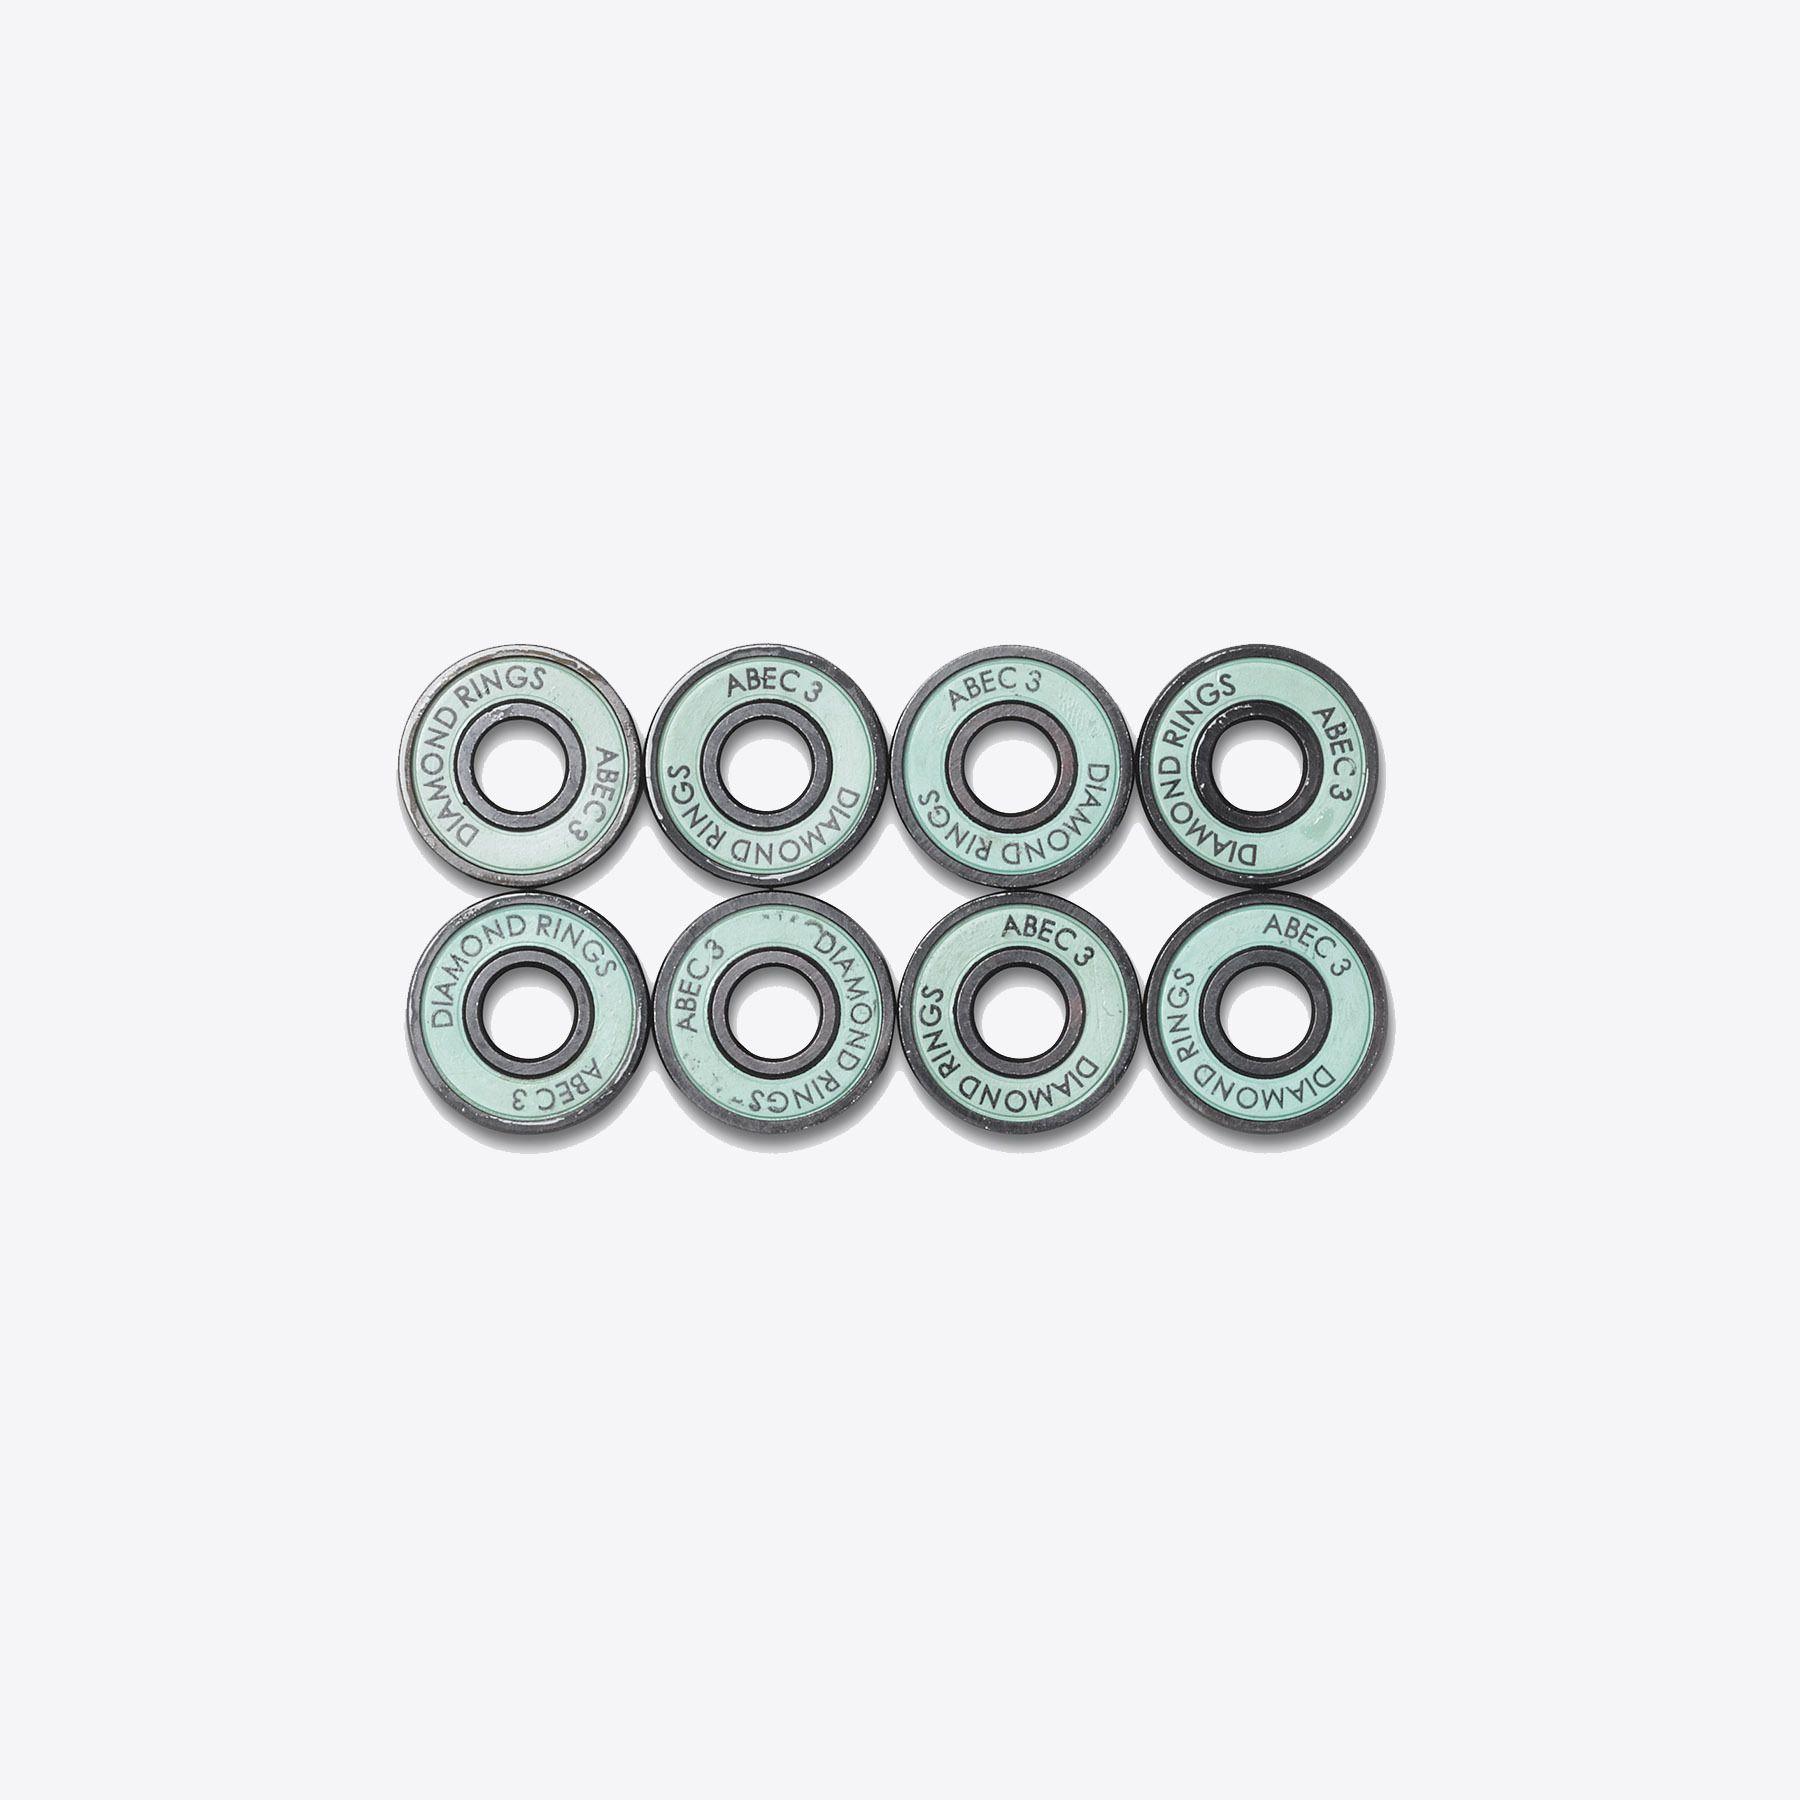 Diamond Rings Hella Fast ABEC 3